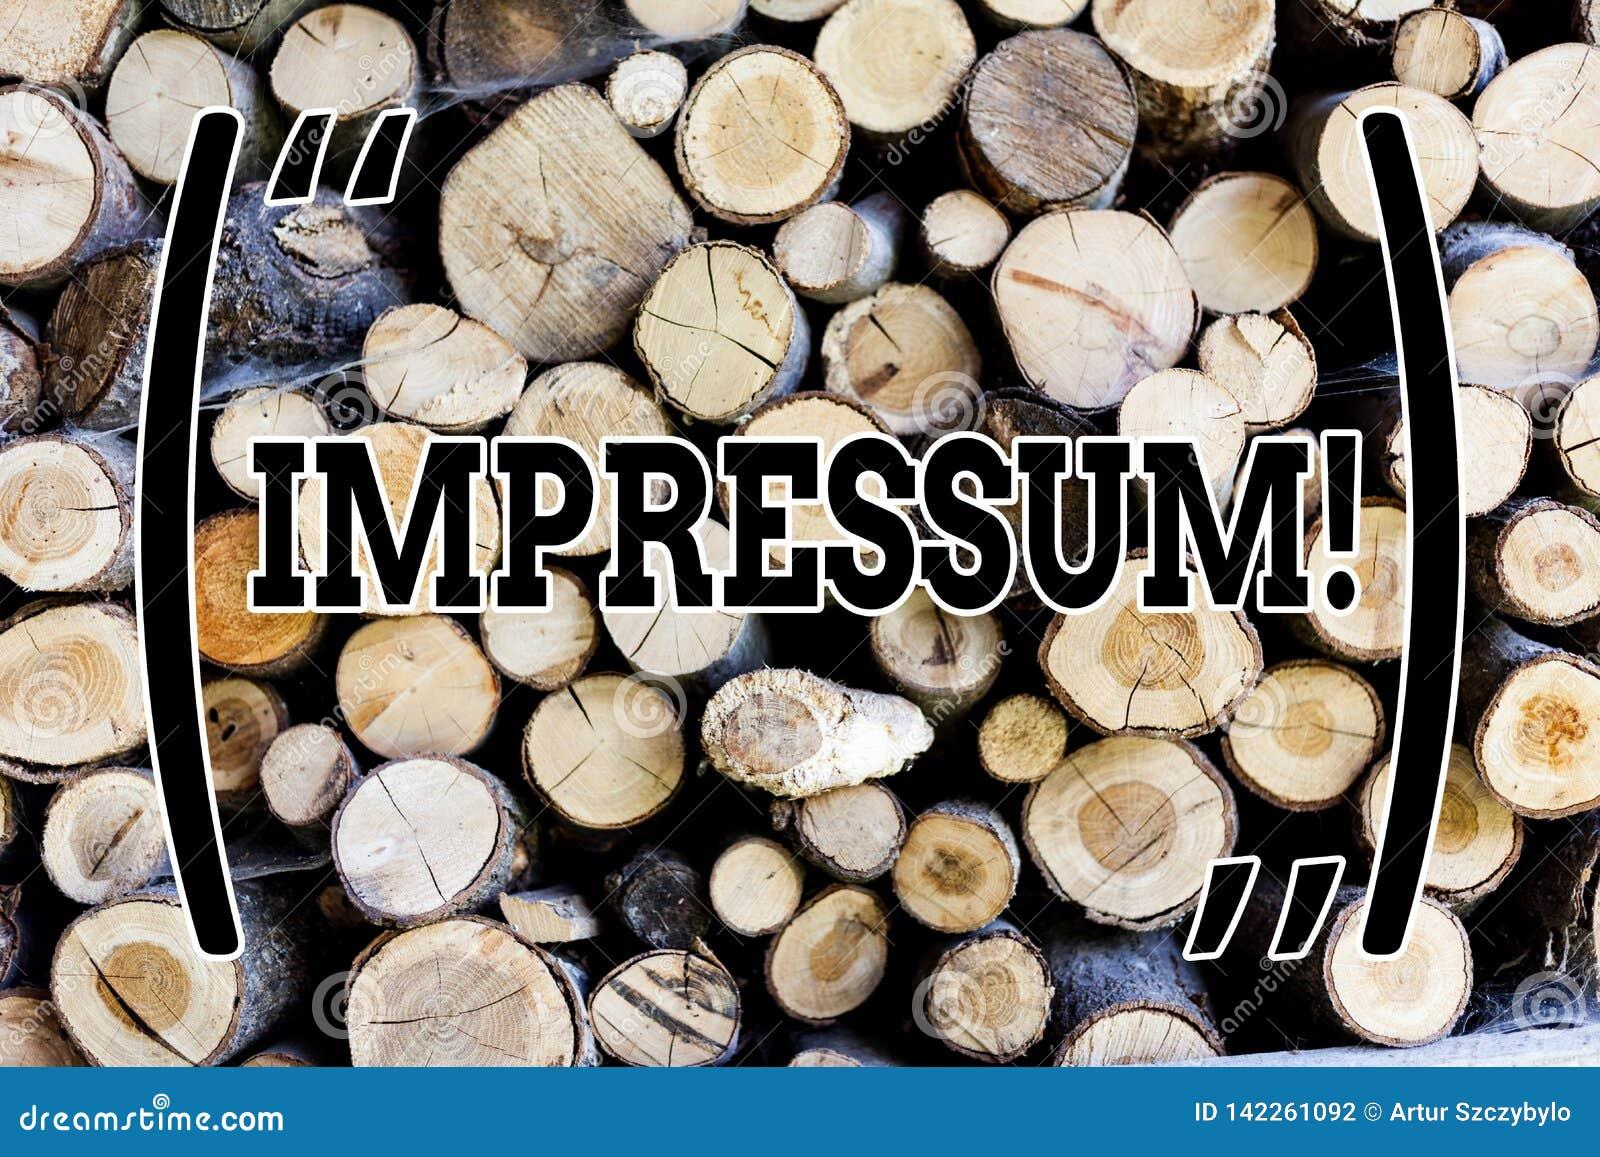 Text sign showing Impressum. Conceptual photo Impressed Engraved Imprint Geranalysis statement ownership authorship